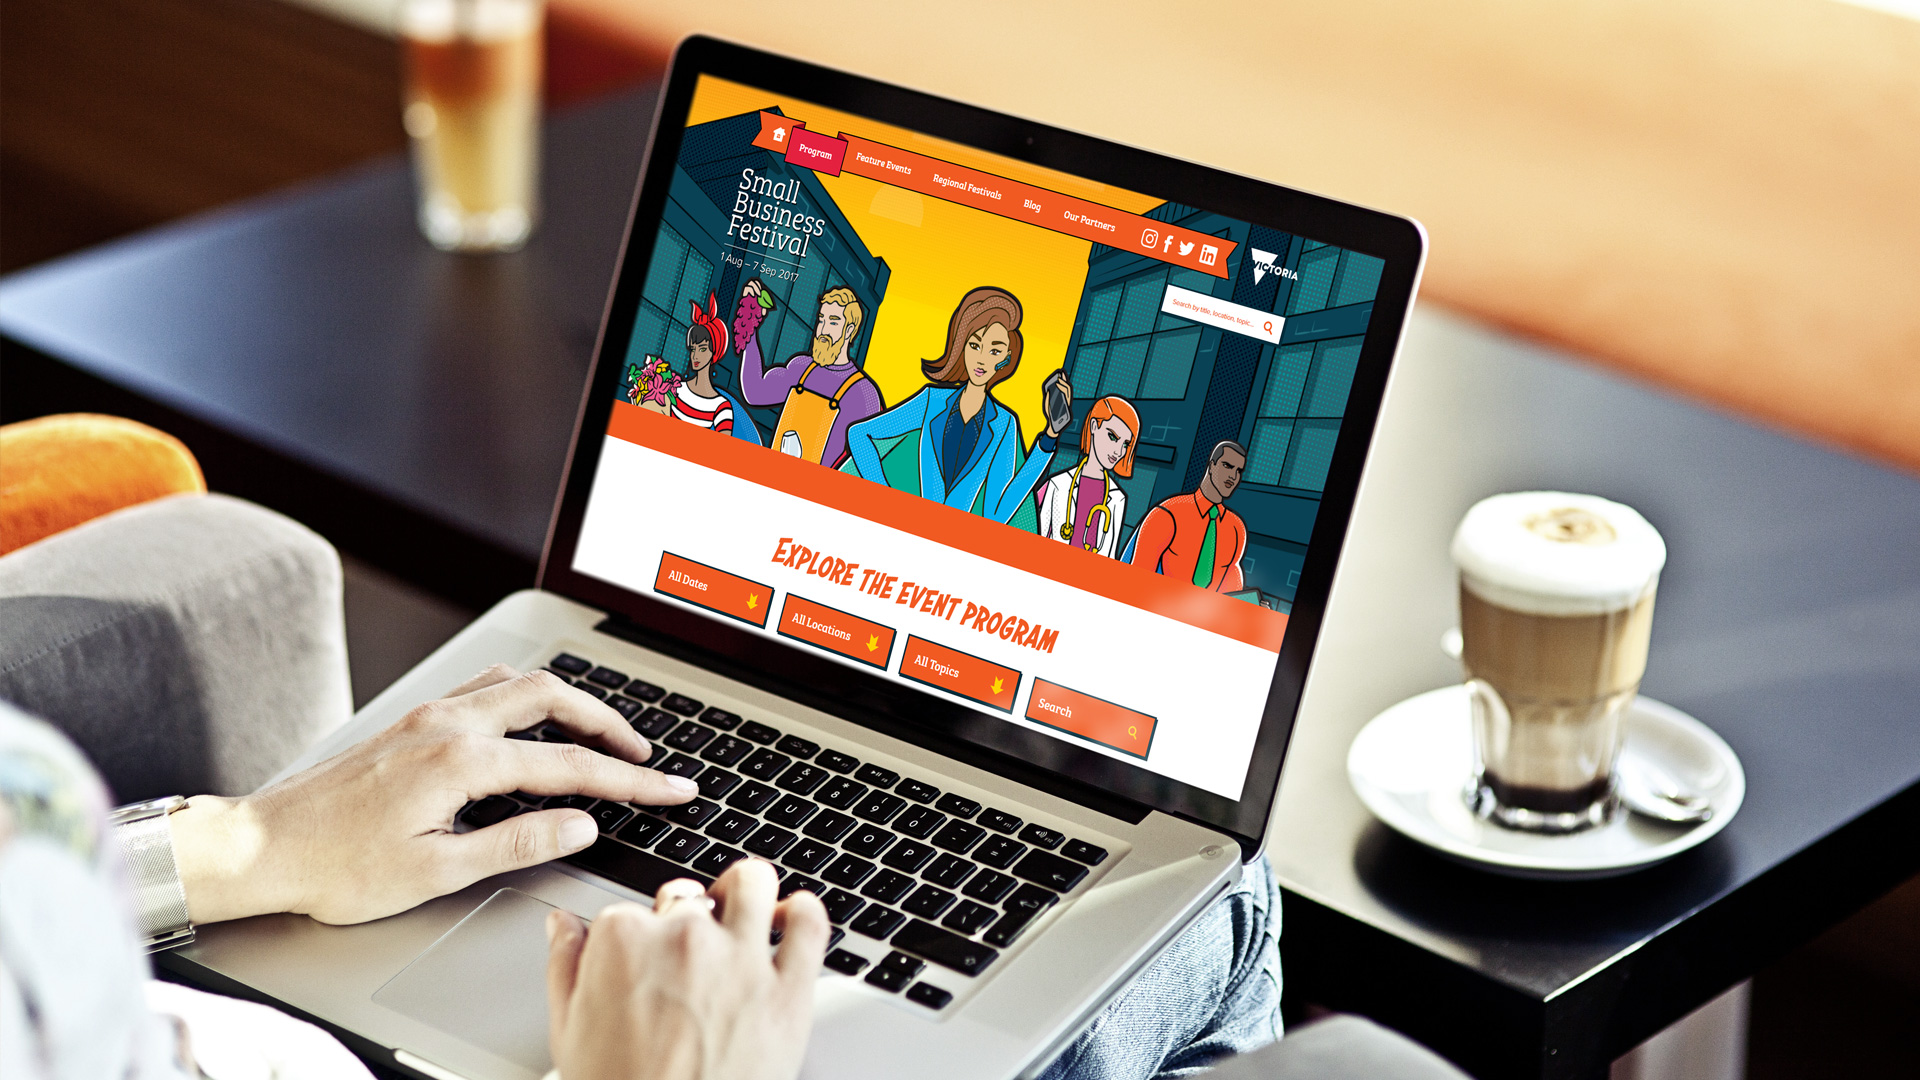 Small Business Festival website